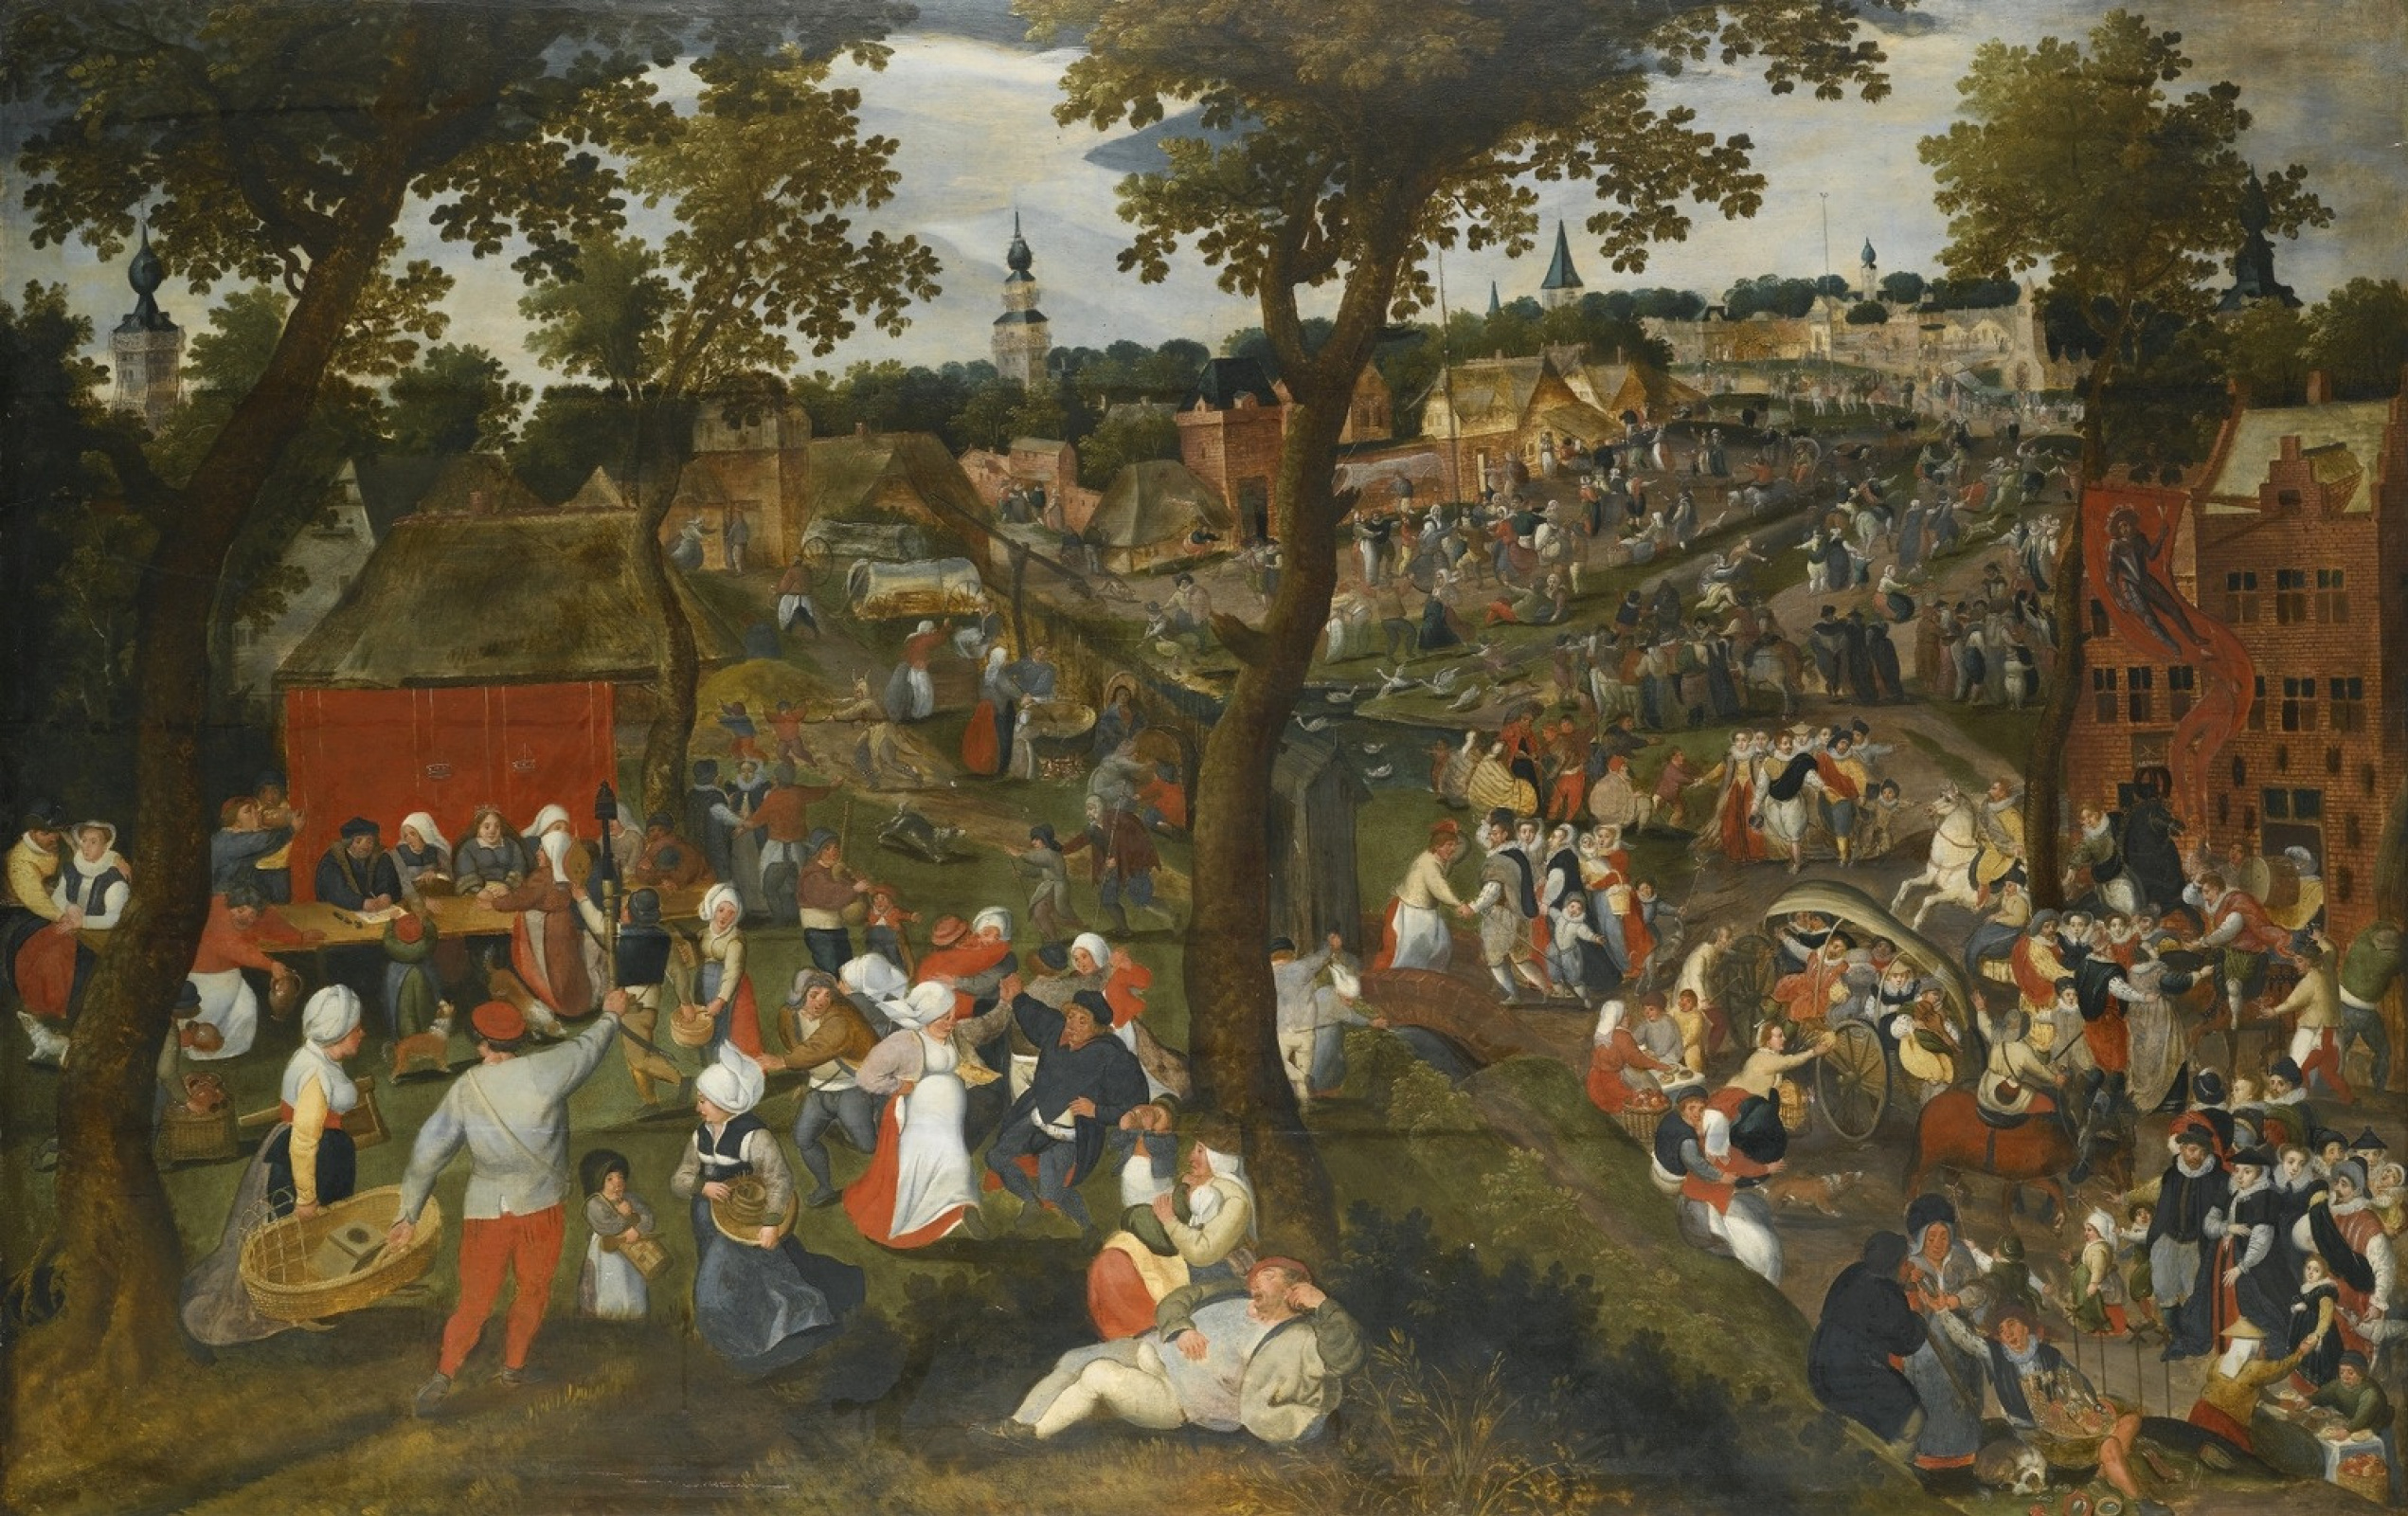 Kermessa saint sebastian by Martin van Cleve: History, Analysis ...